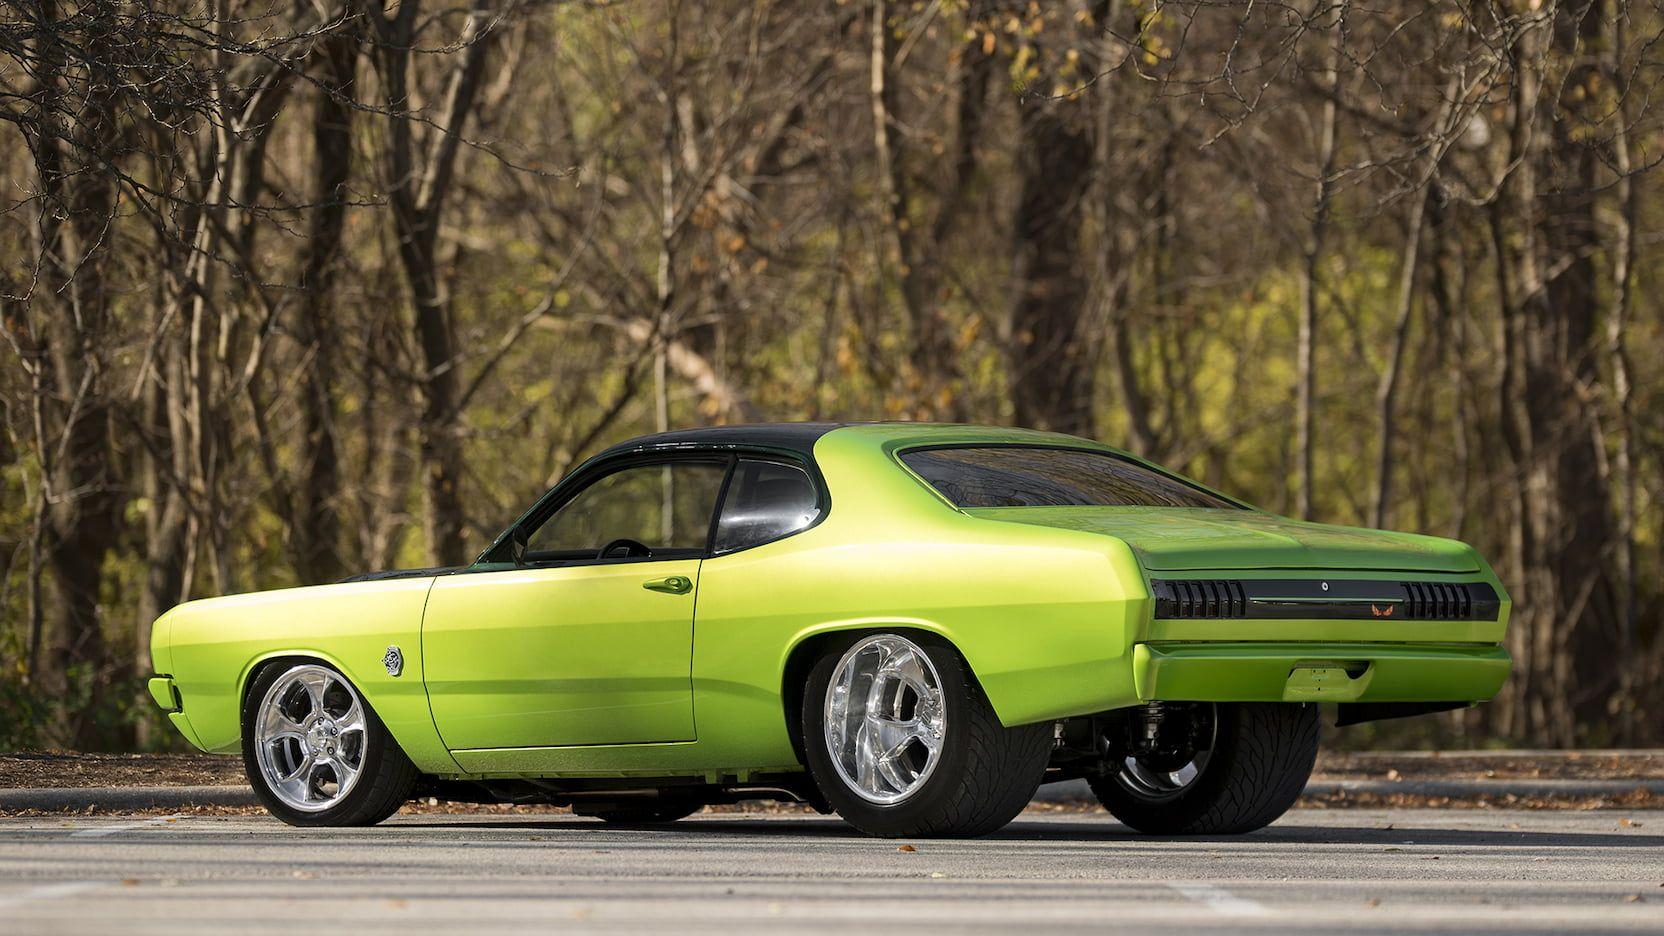 1971 Dodge Demon Resto Mod S254 Kissimmee 2018 1971